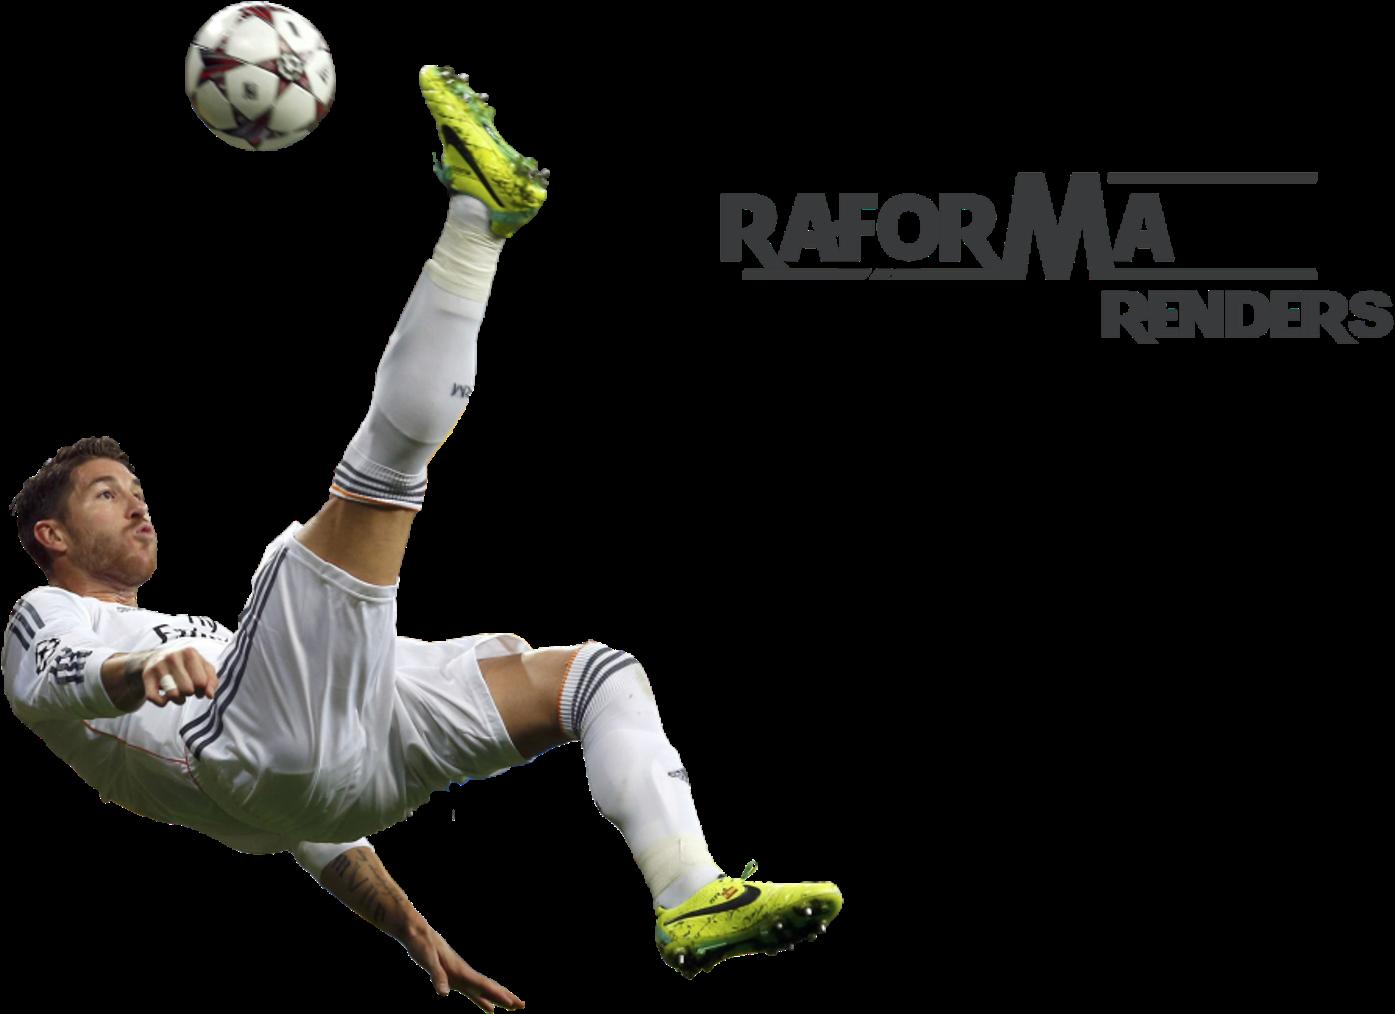 Sergio Ramos Png Sergio Ramos 2014 Wallpapers Hd Wallpapers 1080p Sergio 4k Sergio Ramos Hd 1622031 Vippng